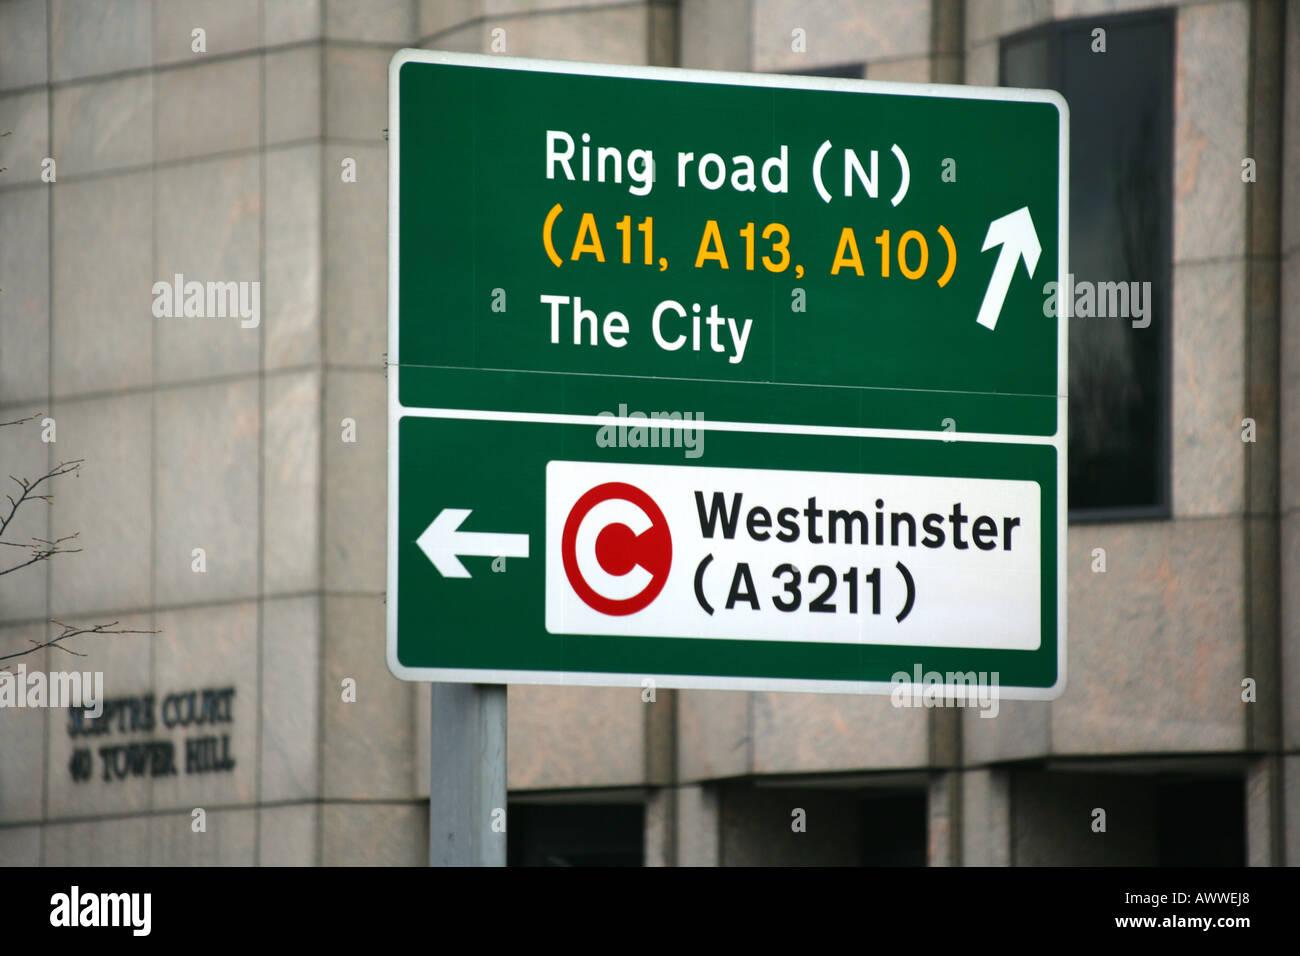 Road sign featuring congestion charging logo, London, England, UK. - Stock Image